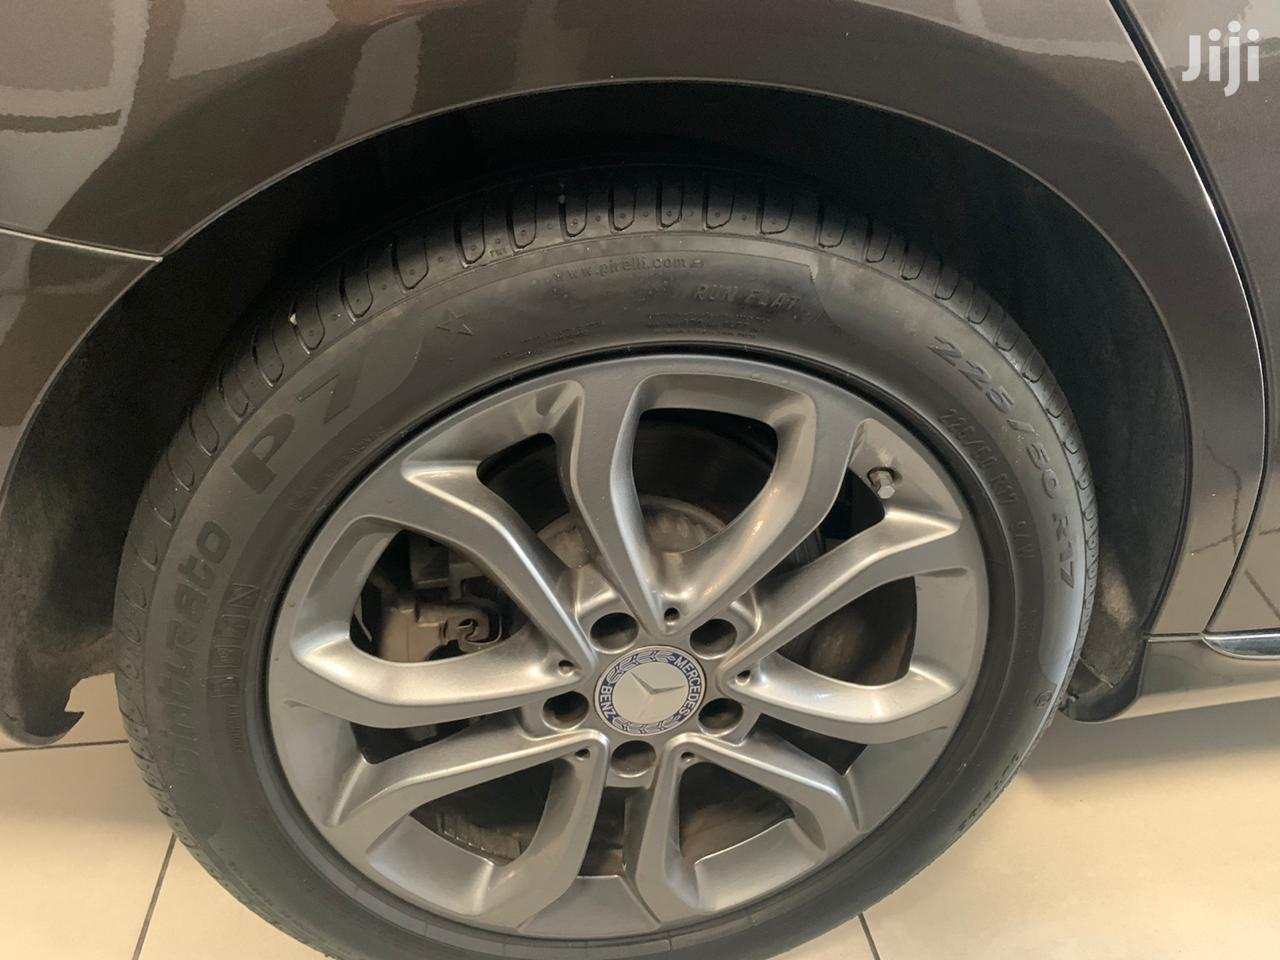 Mercedes-Benz C200 2015 Brown | Cars for sale in Mvita, Mombasa, Kenya